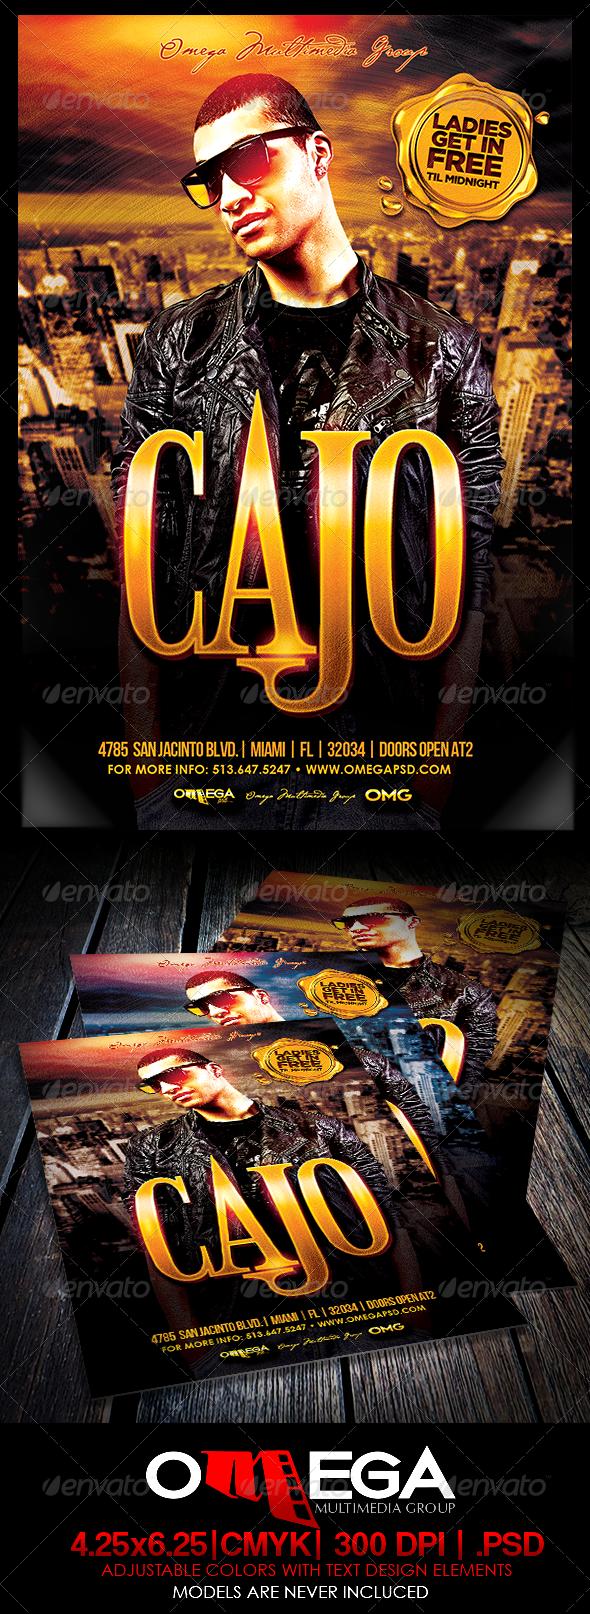 GraphicRiver Special Guest Cajo 8508530